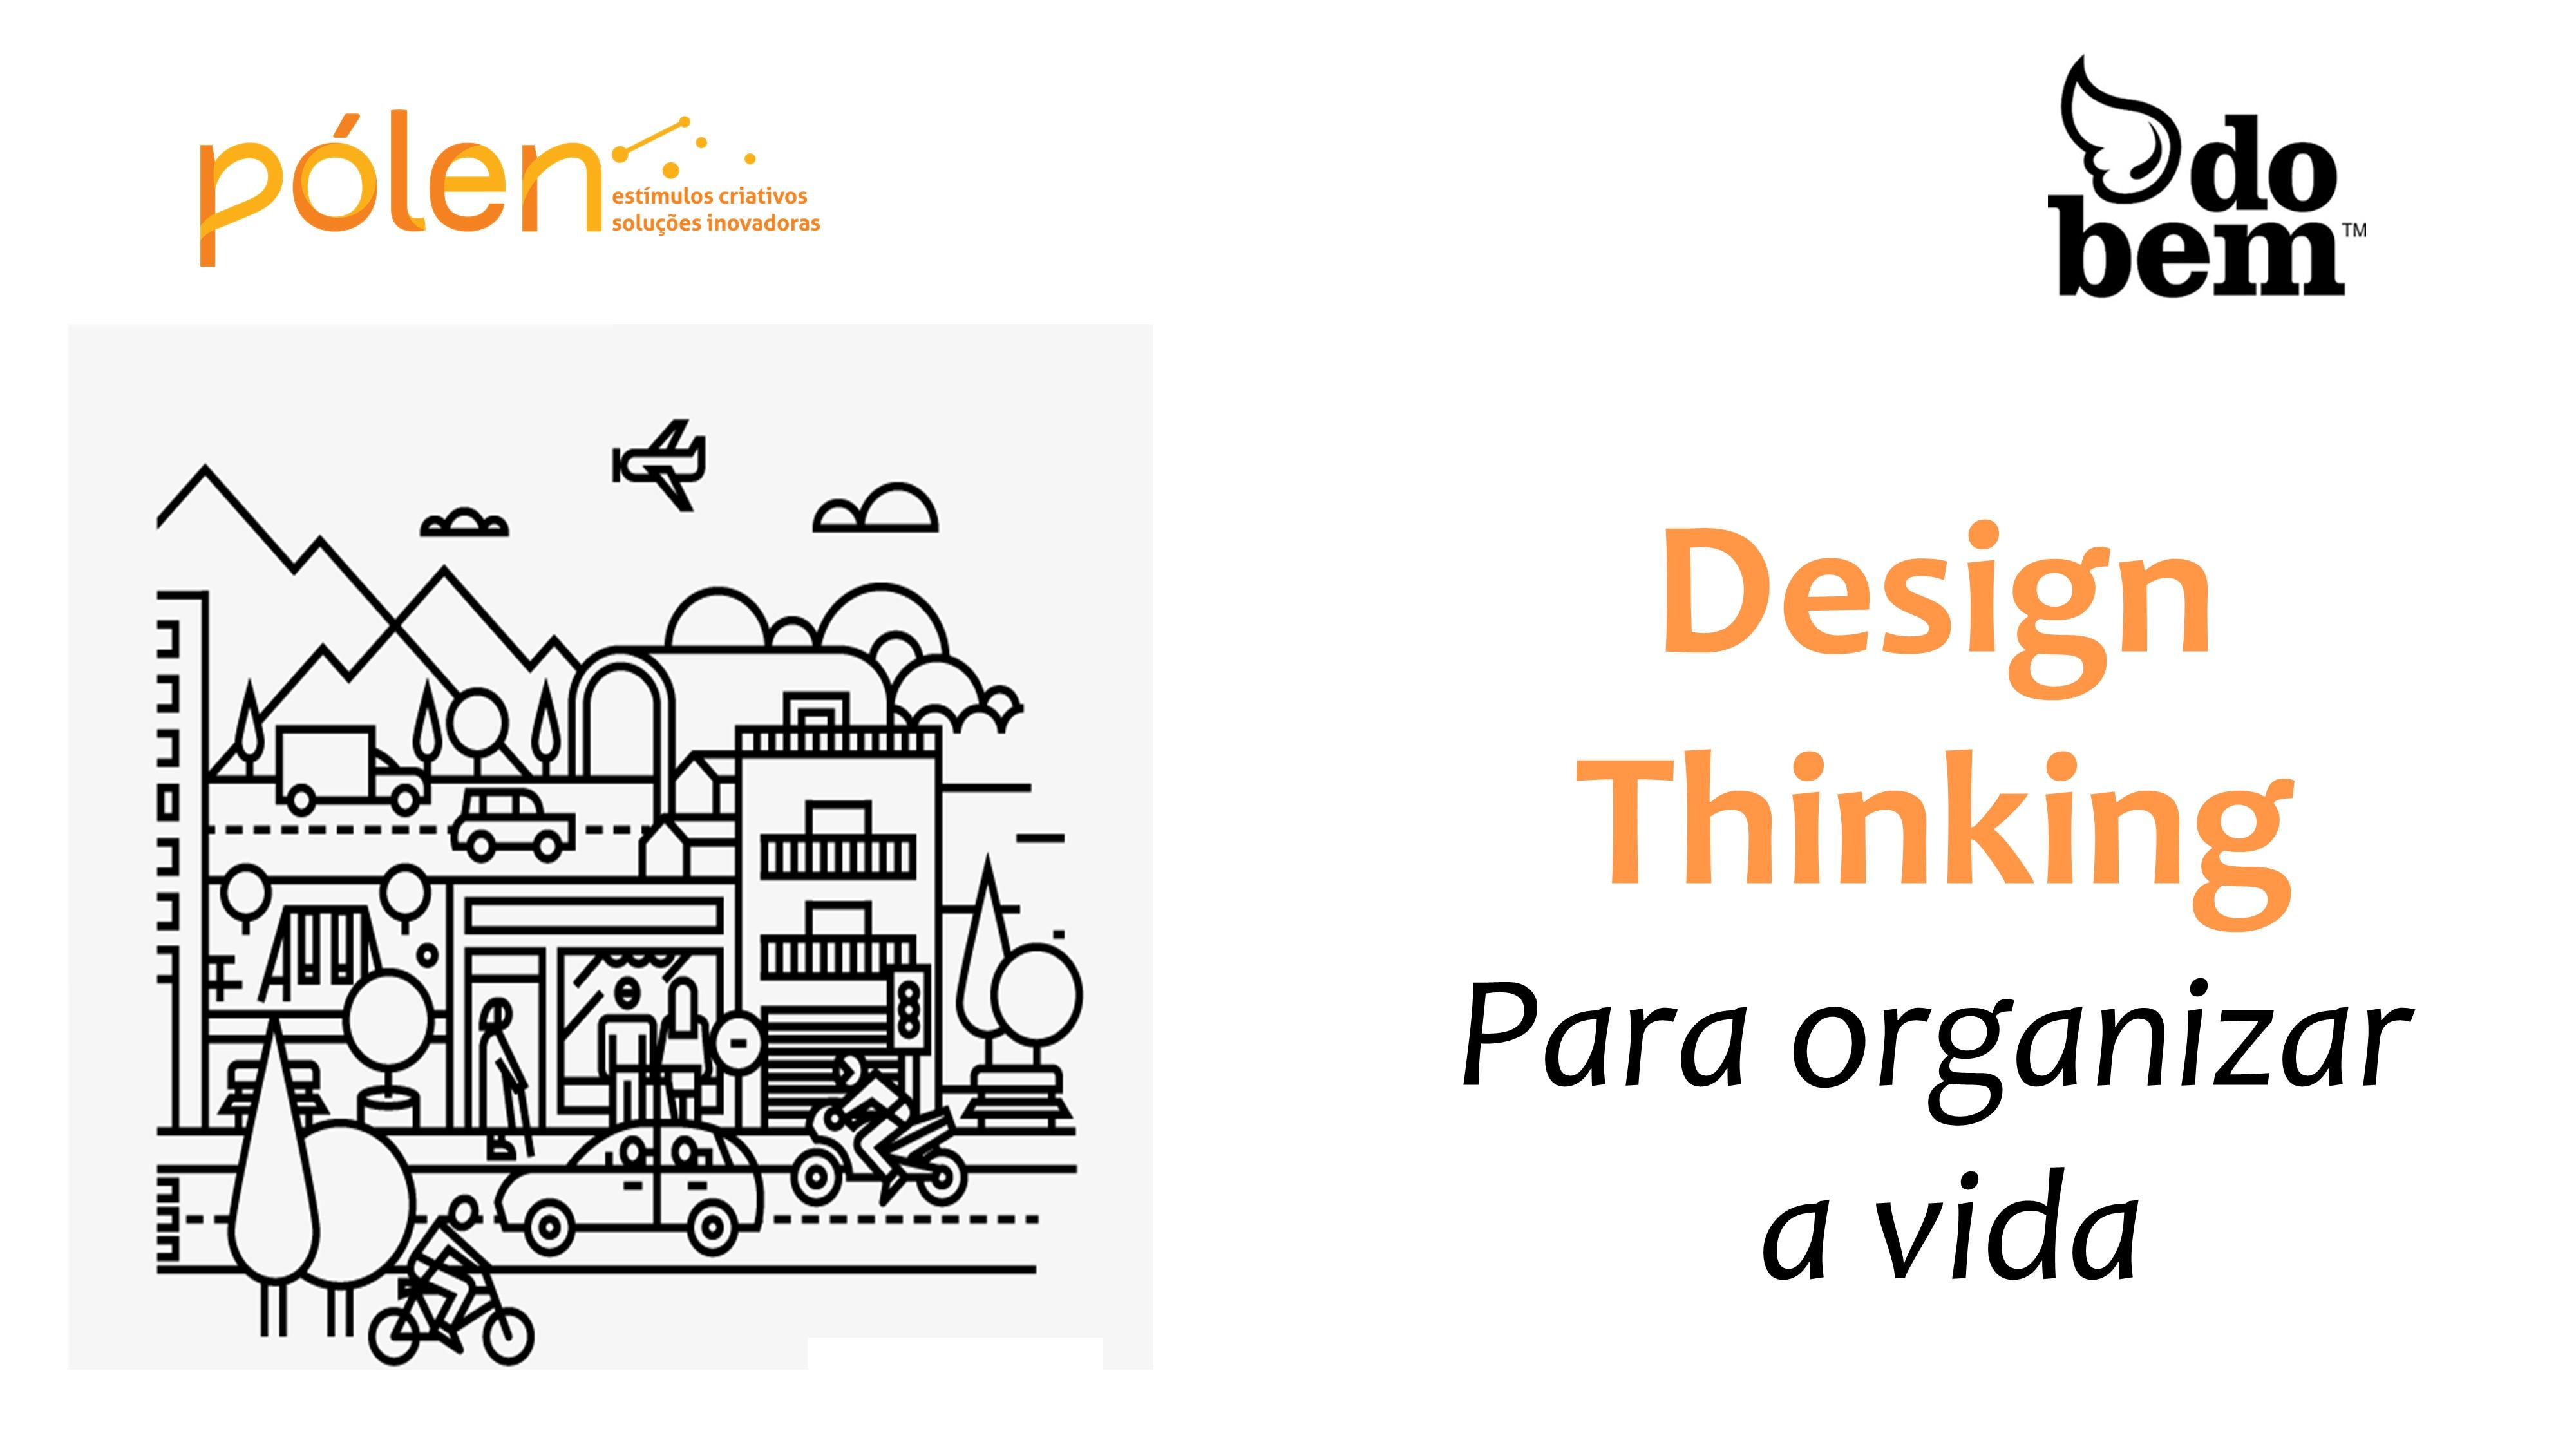 Design Thinking para organizar a vida